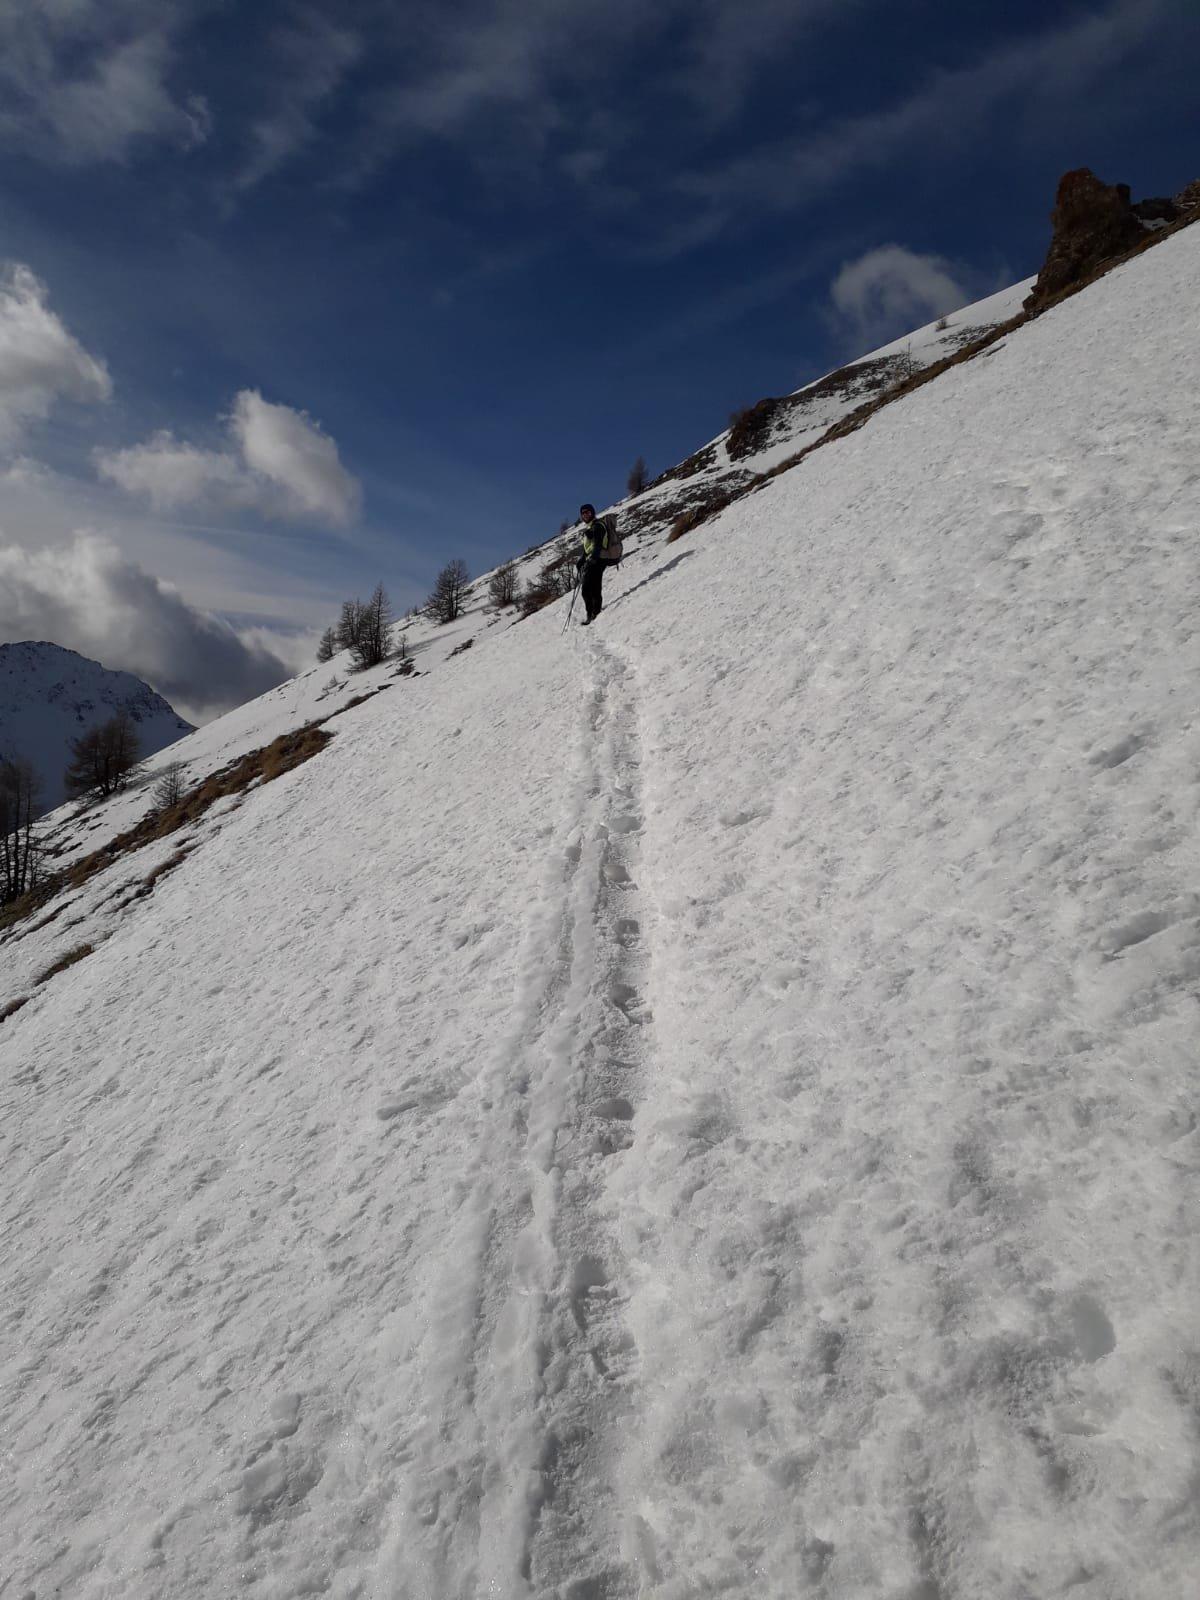 8-1-19 nevai sul sentiero verso il m.te jafferau